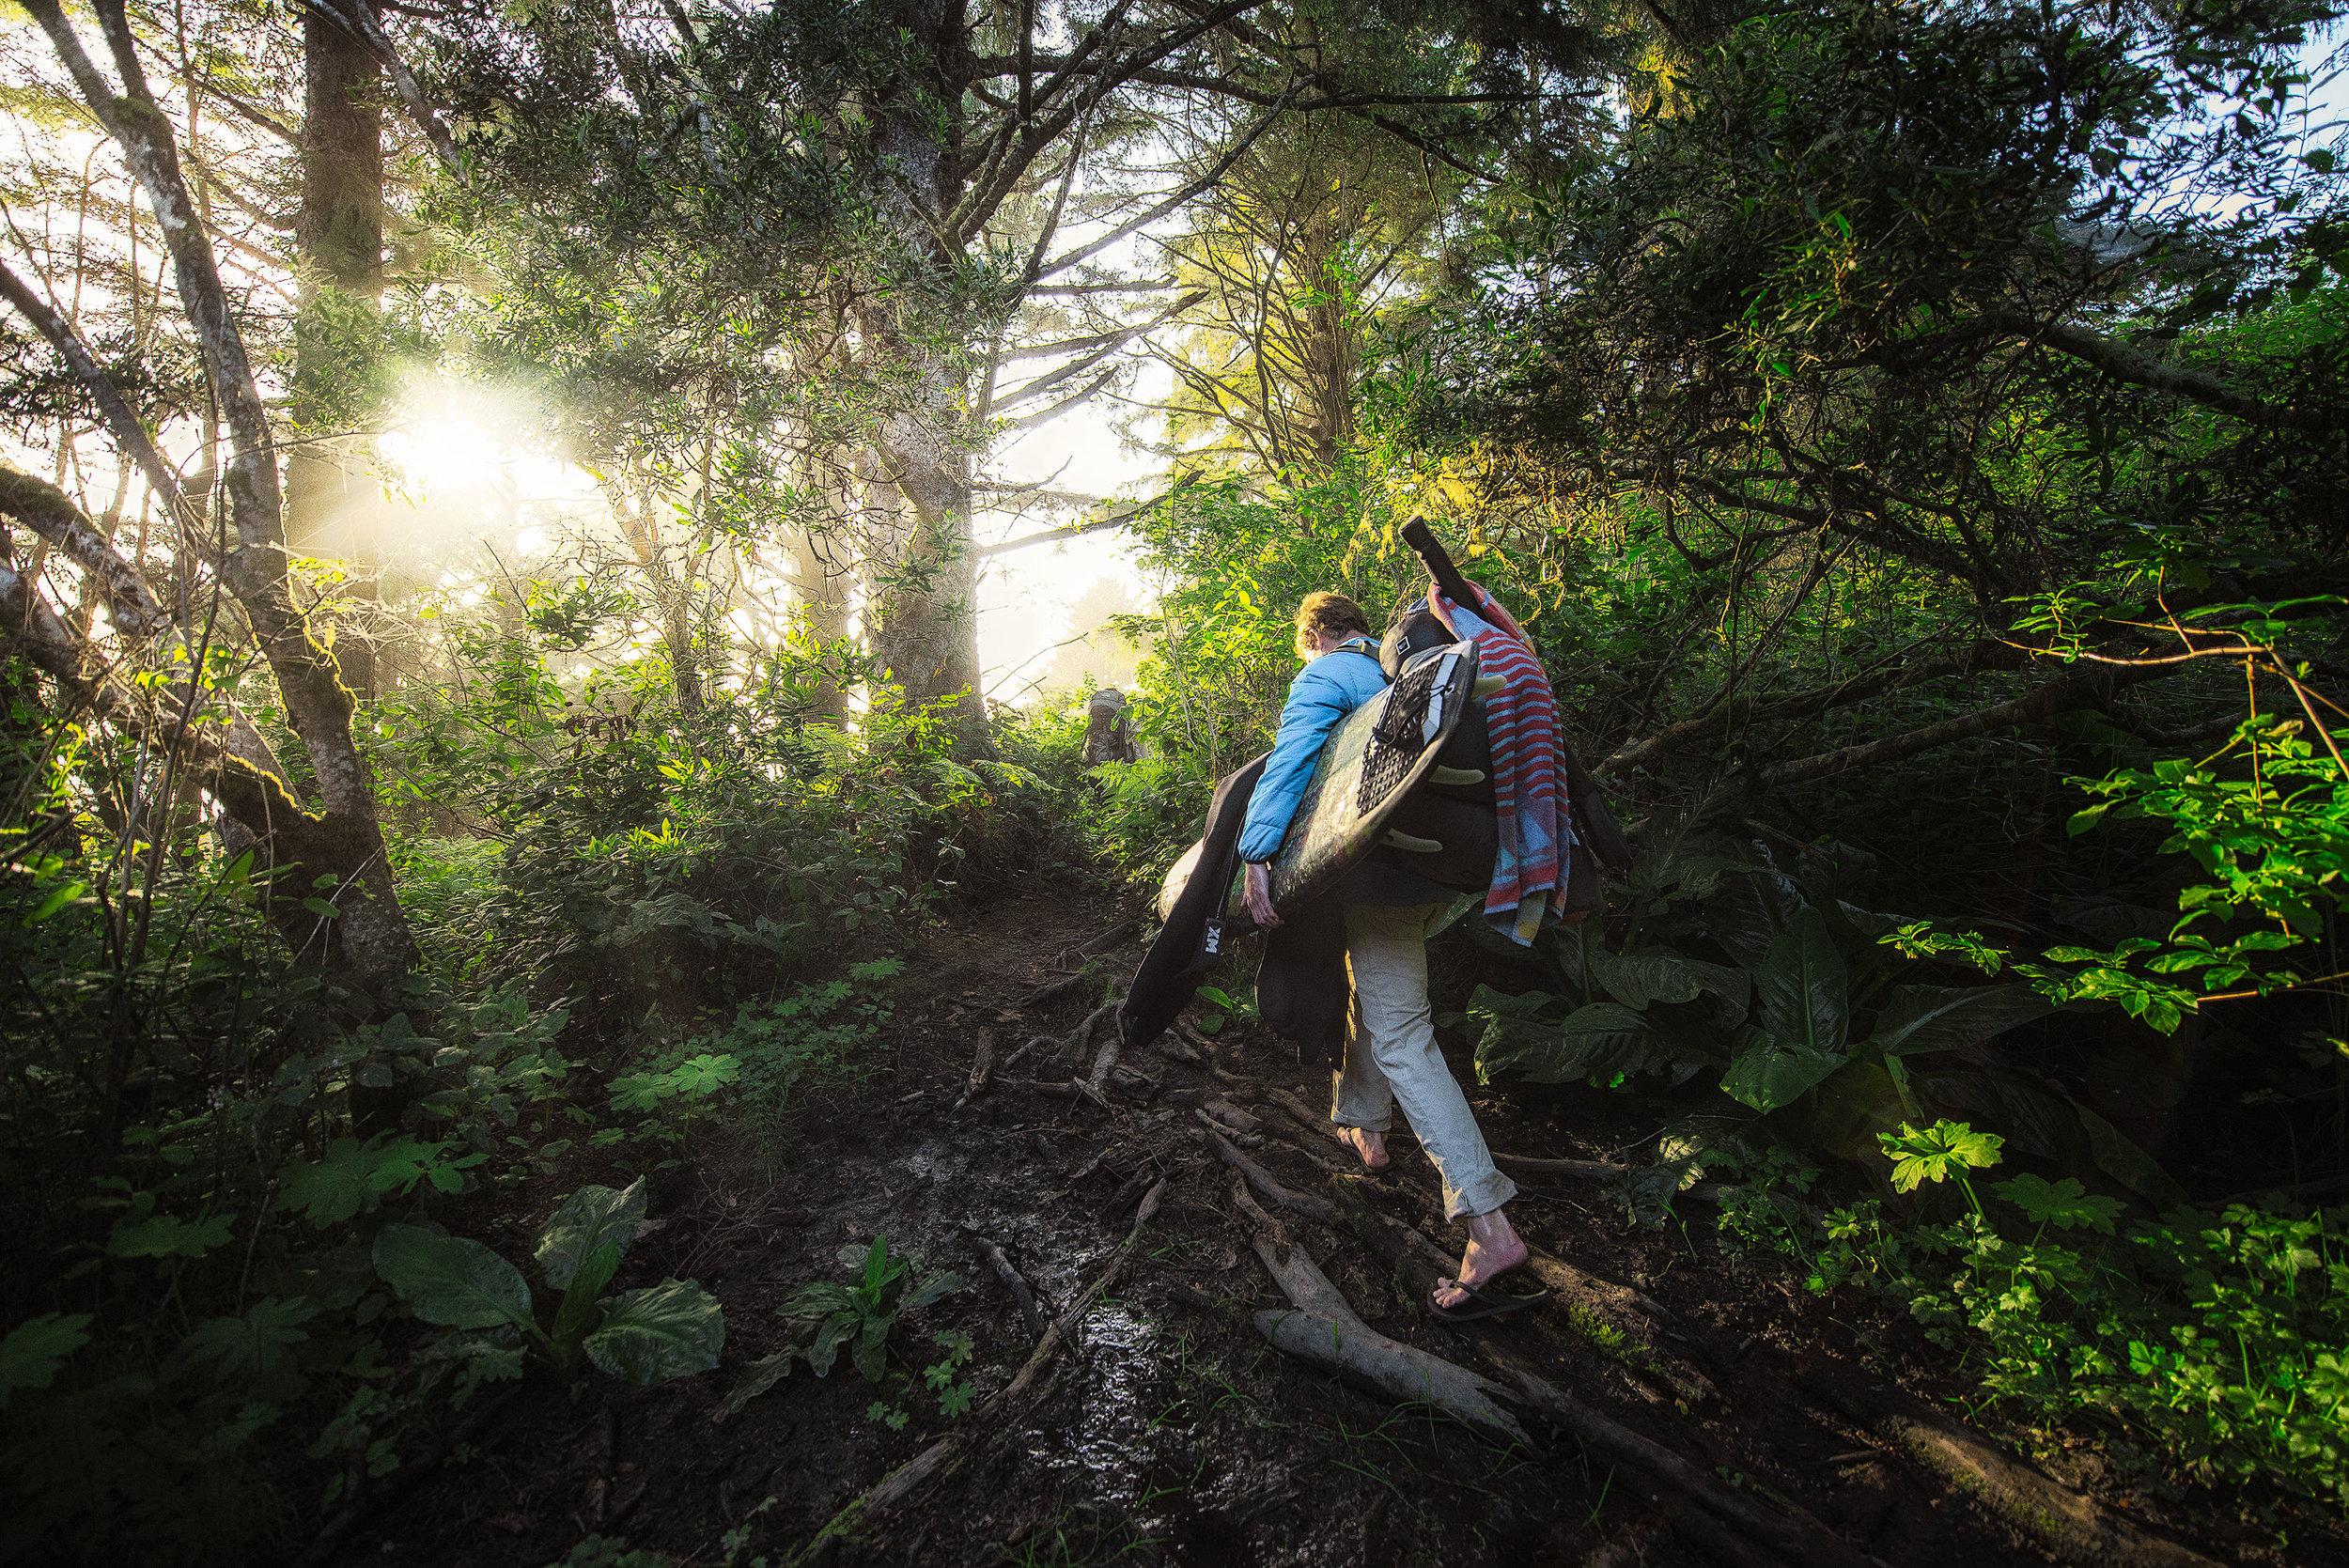 austin-trigg-redwood-water-bottle-hike-beach-california-sunshine-forest-surfboard-adventure.jpg